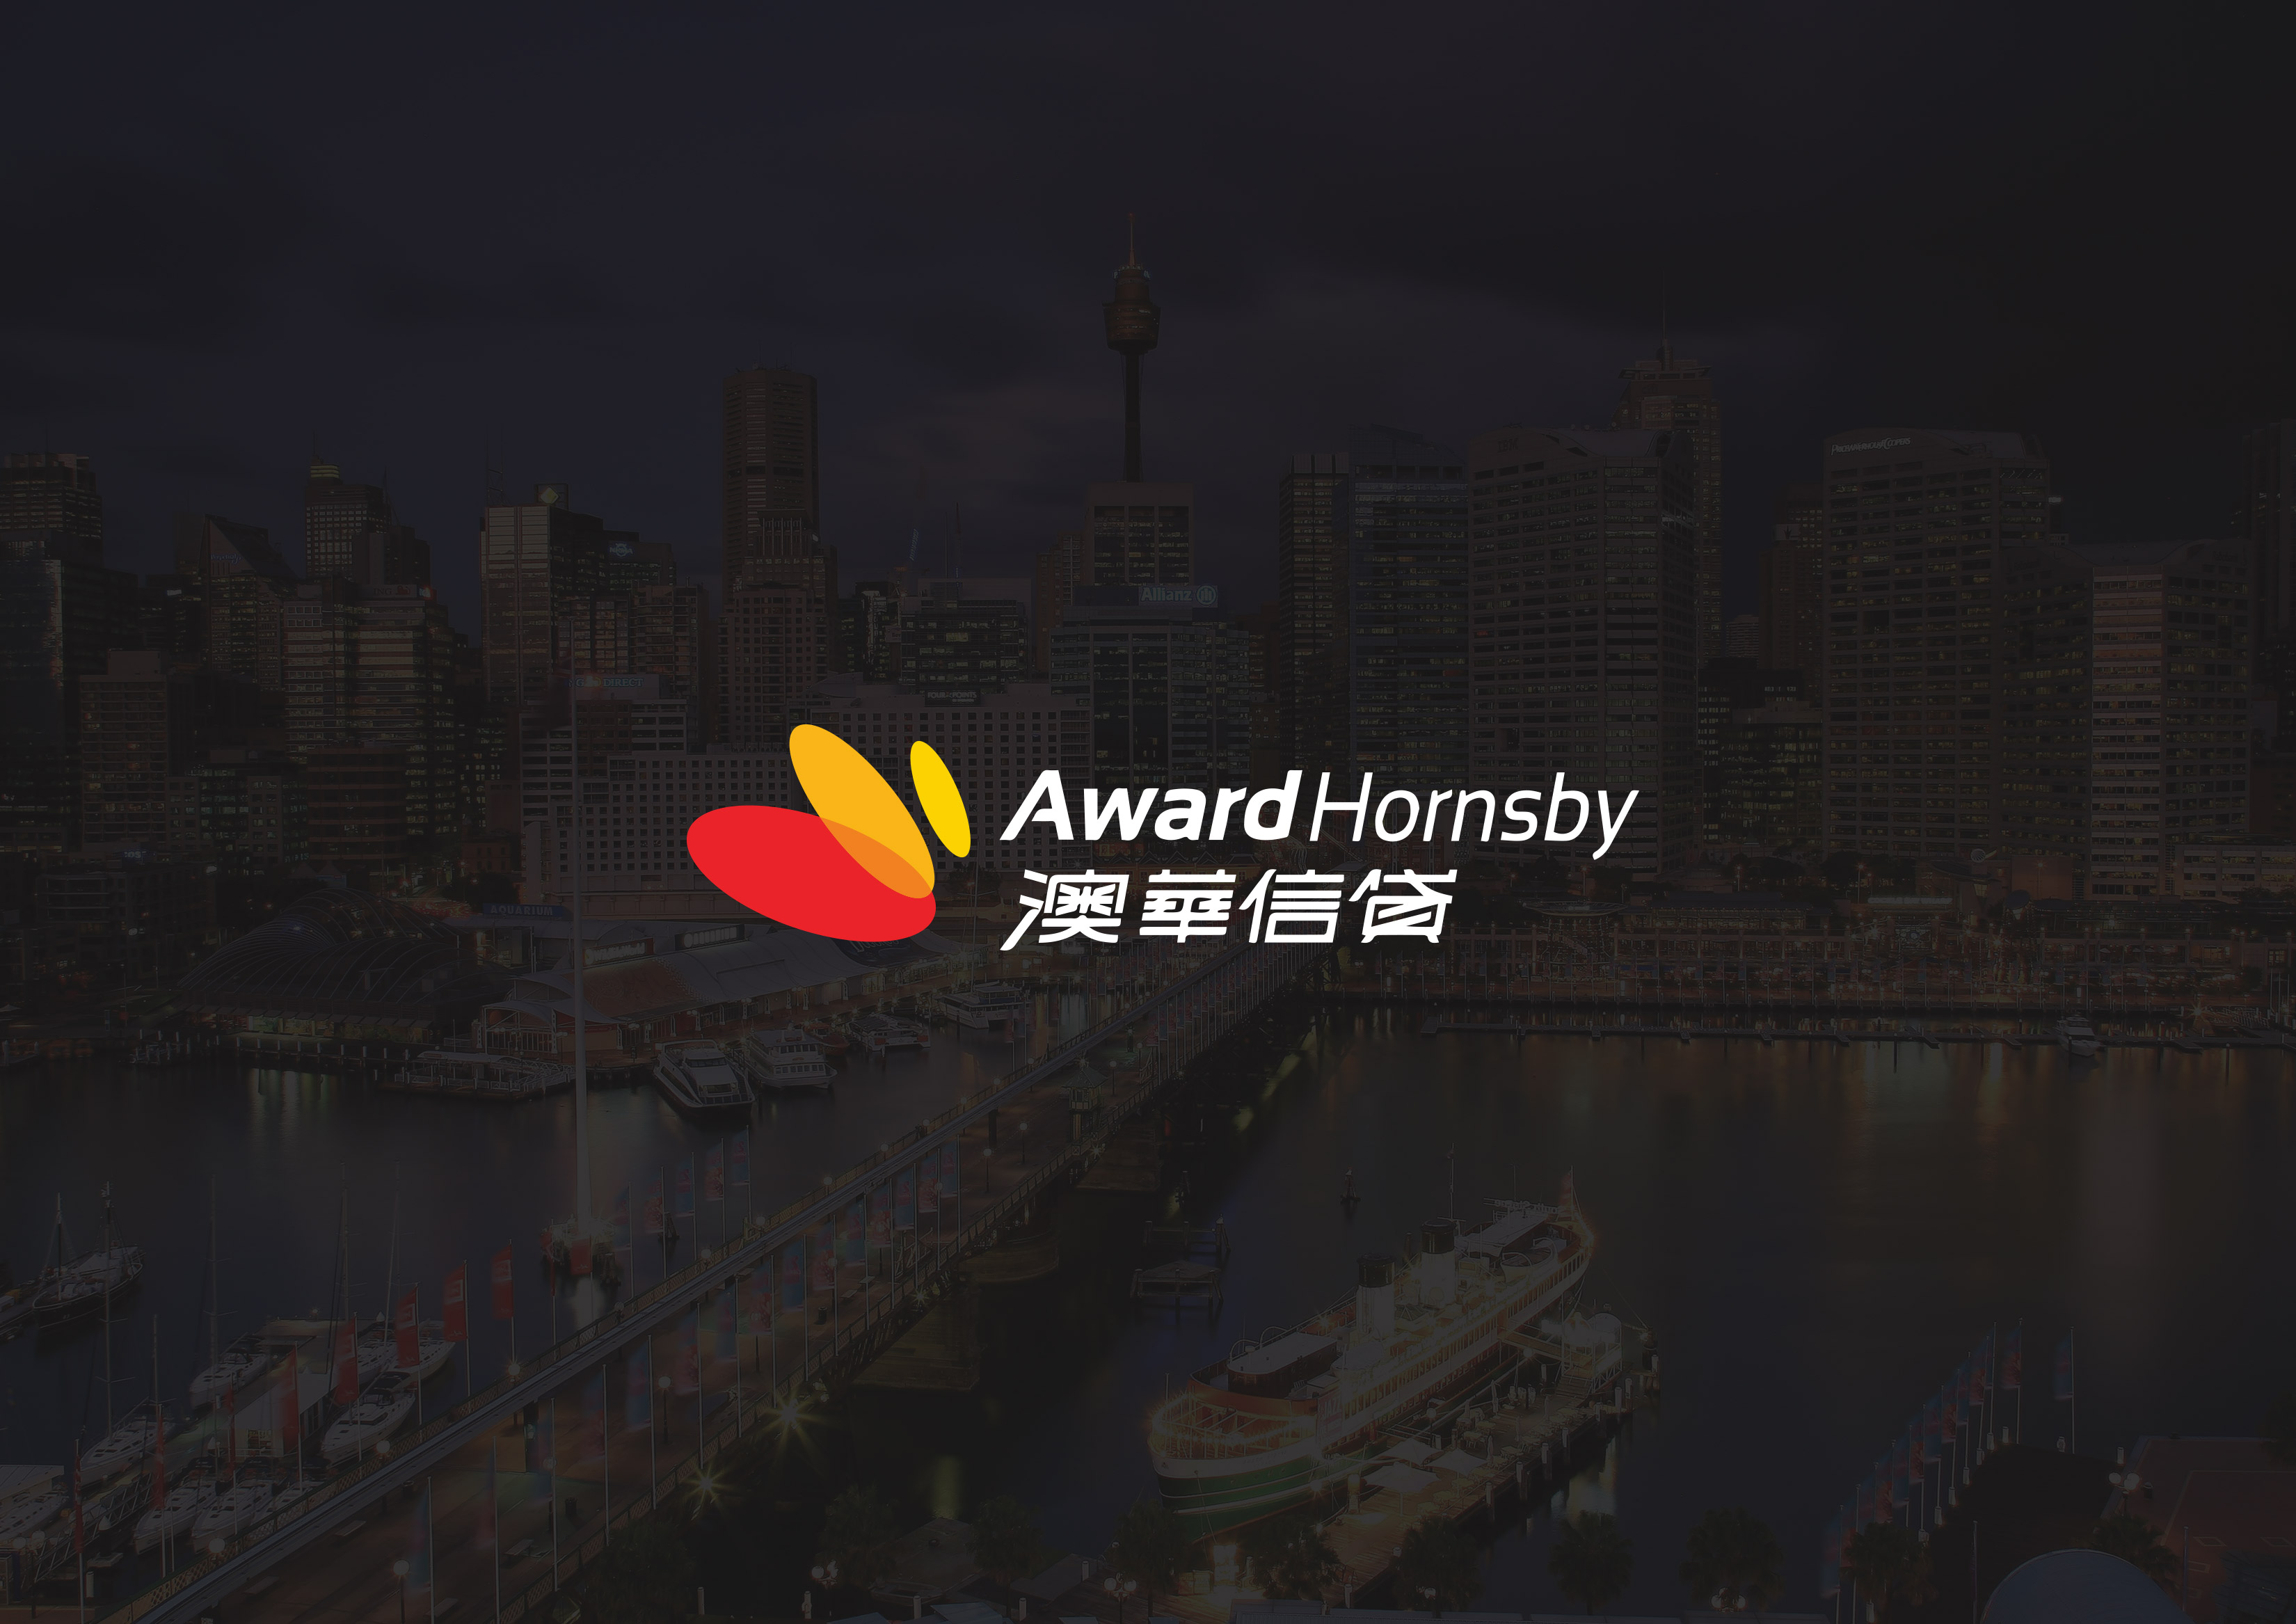 AwardHornsby-1